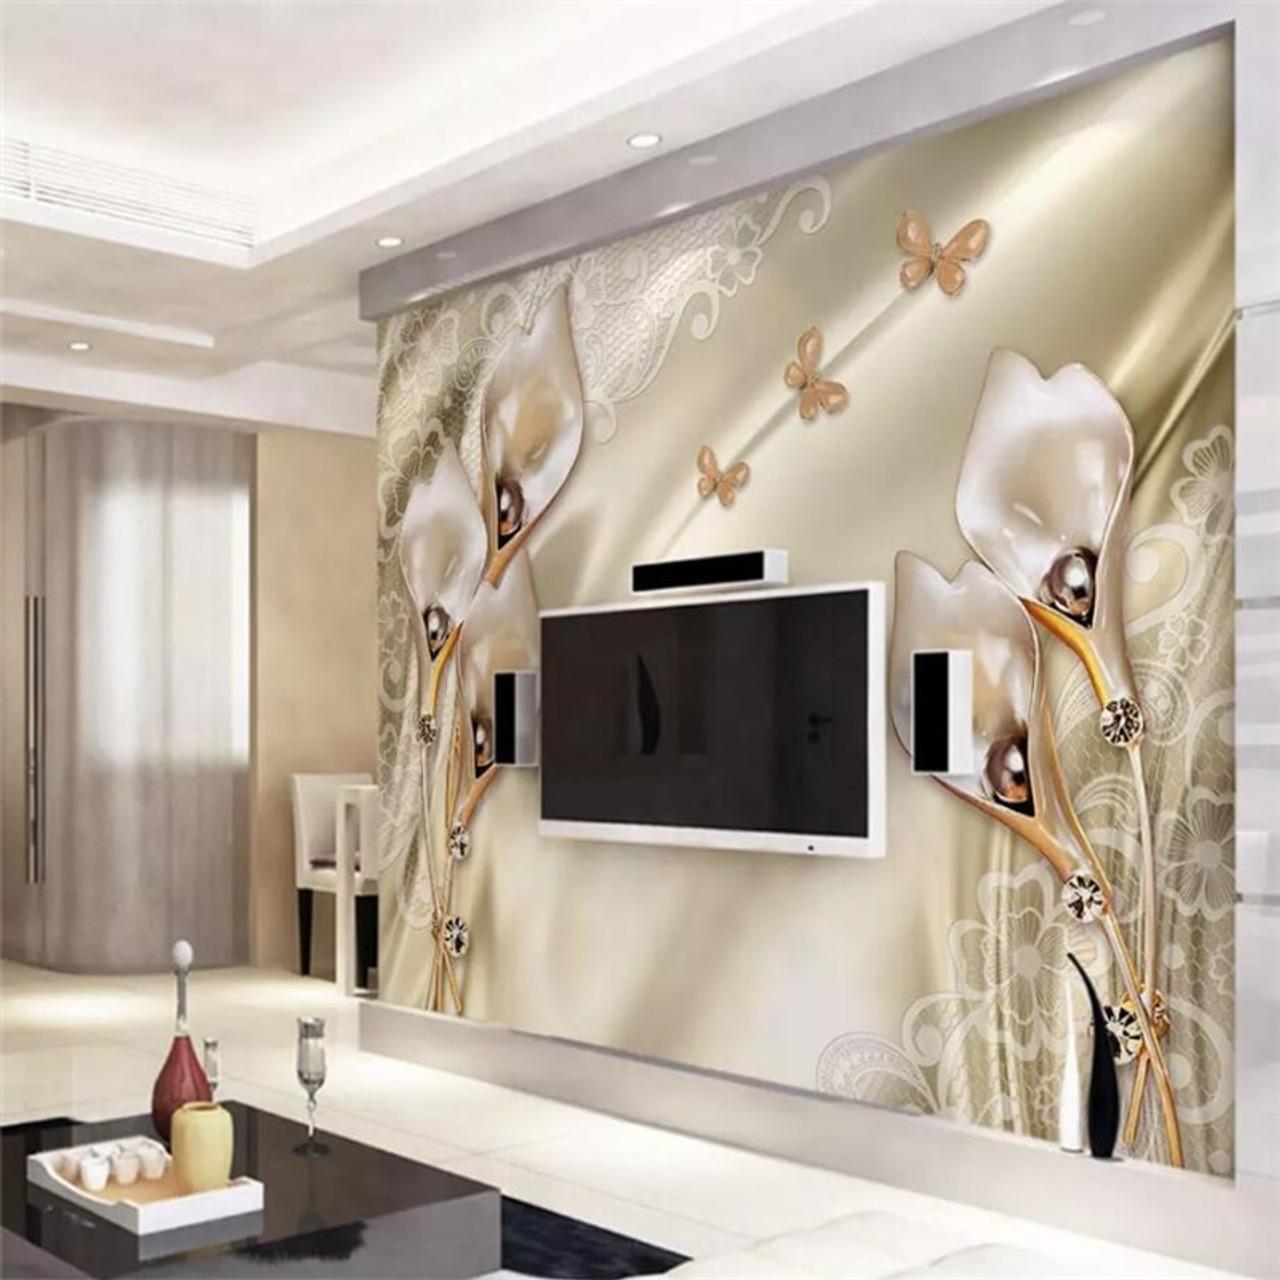 Beibehang 3d Wallpaper Murals Custom Living Room Bedroom Luxury Satin Champagne Tulip Mural Background Wall Home Decoration Onshopdeals Com